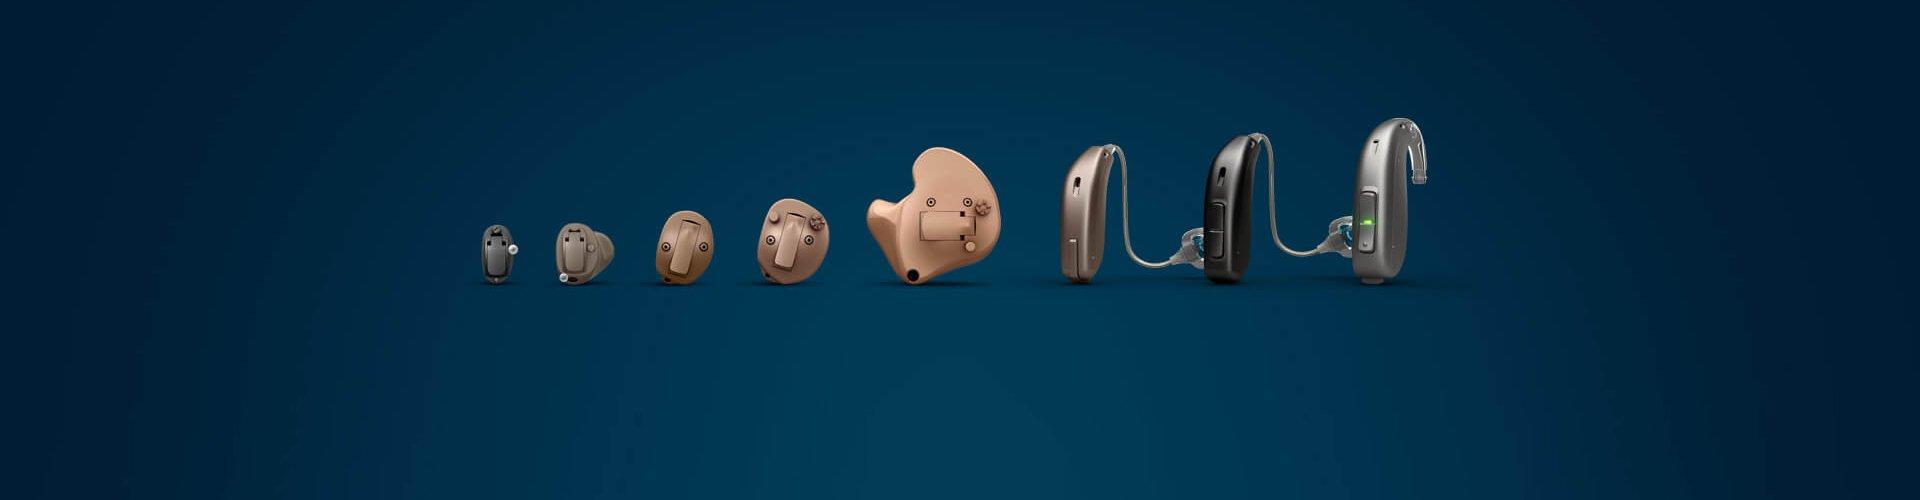 types-of-hearing-aids-1_slim